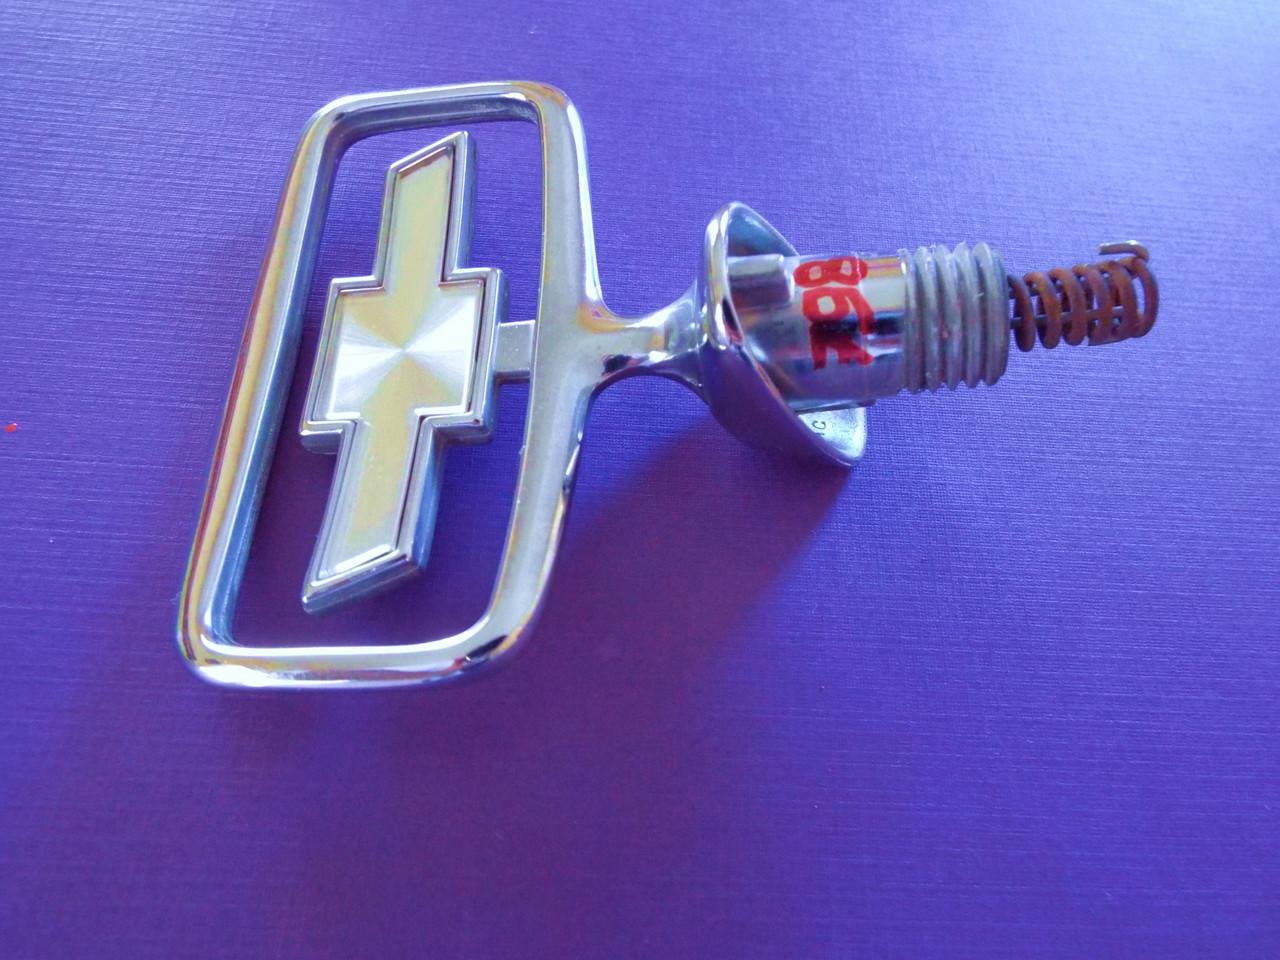 1996 Chevrolet Caprice Hood Ornament 1995 Chevrolet Caprice Hood Ornament 1994 Chevrolet Caprice Hood Ornament 1993 Chevrolet Caprice Hood Ornament 1992 Chevrolet Caprice Hood Ornament 1991 Chevrolet Caprice Hood Ornament